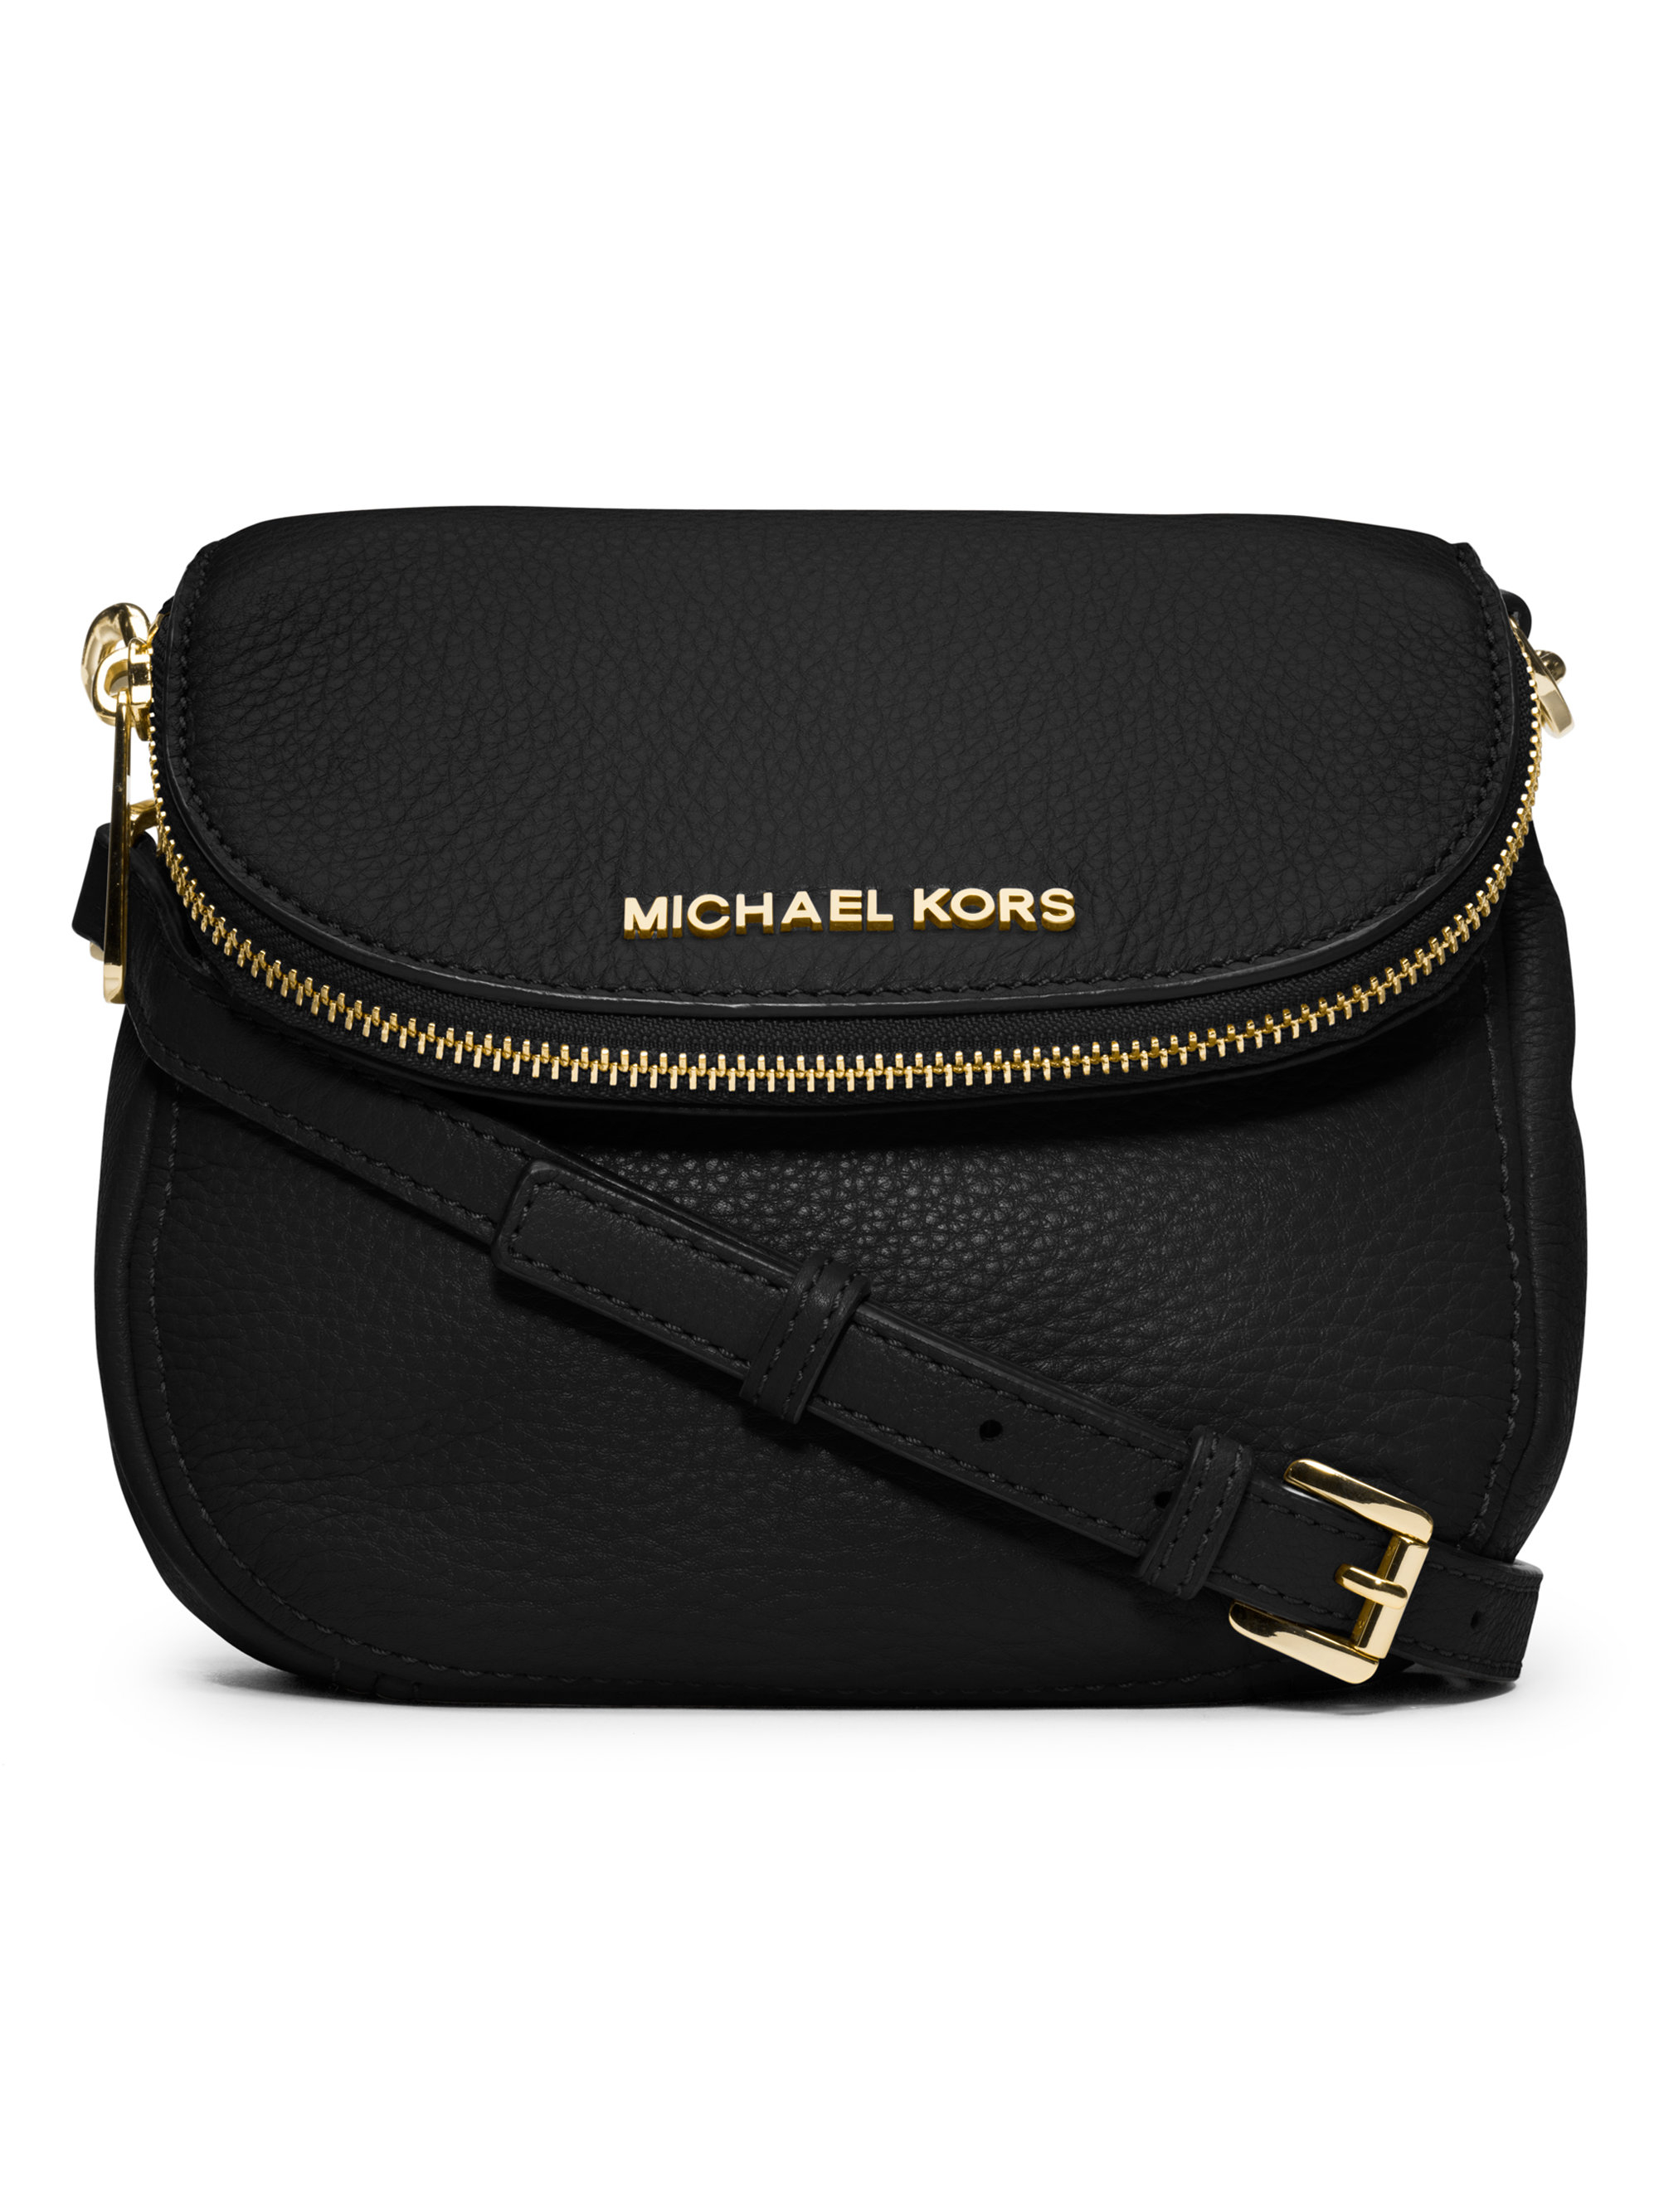 7aedd49611c4dc MICHAEL Michael Kors Bedford Small Leather Crossbody Bag in Black - Lyst